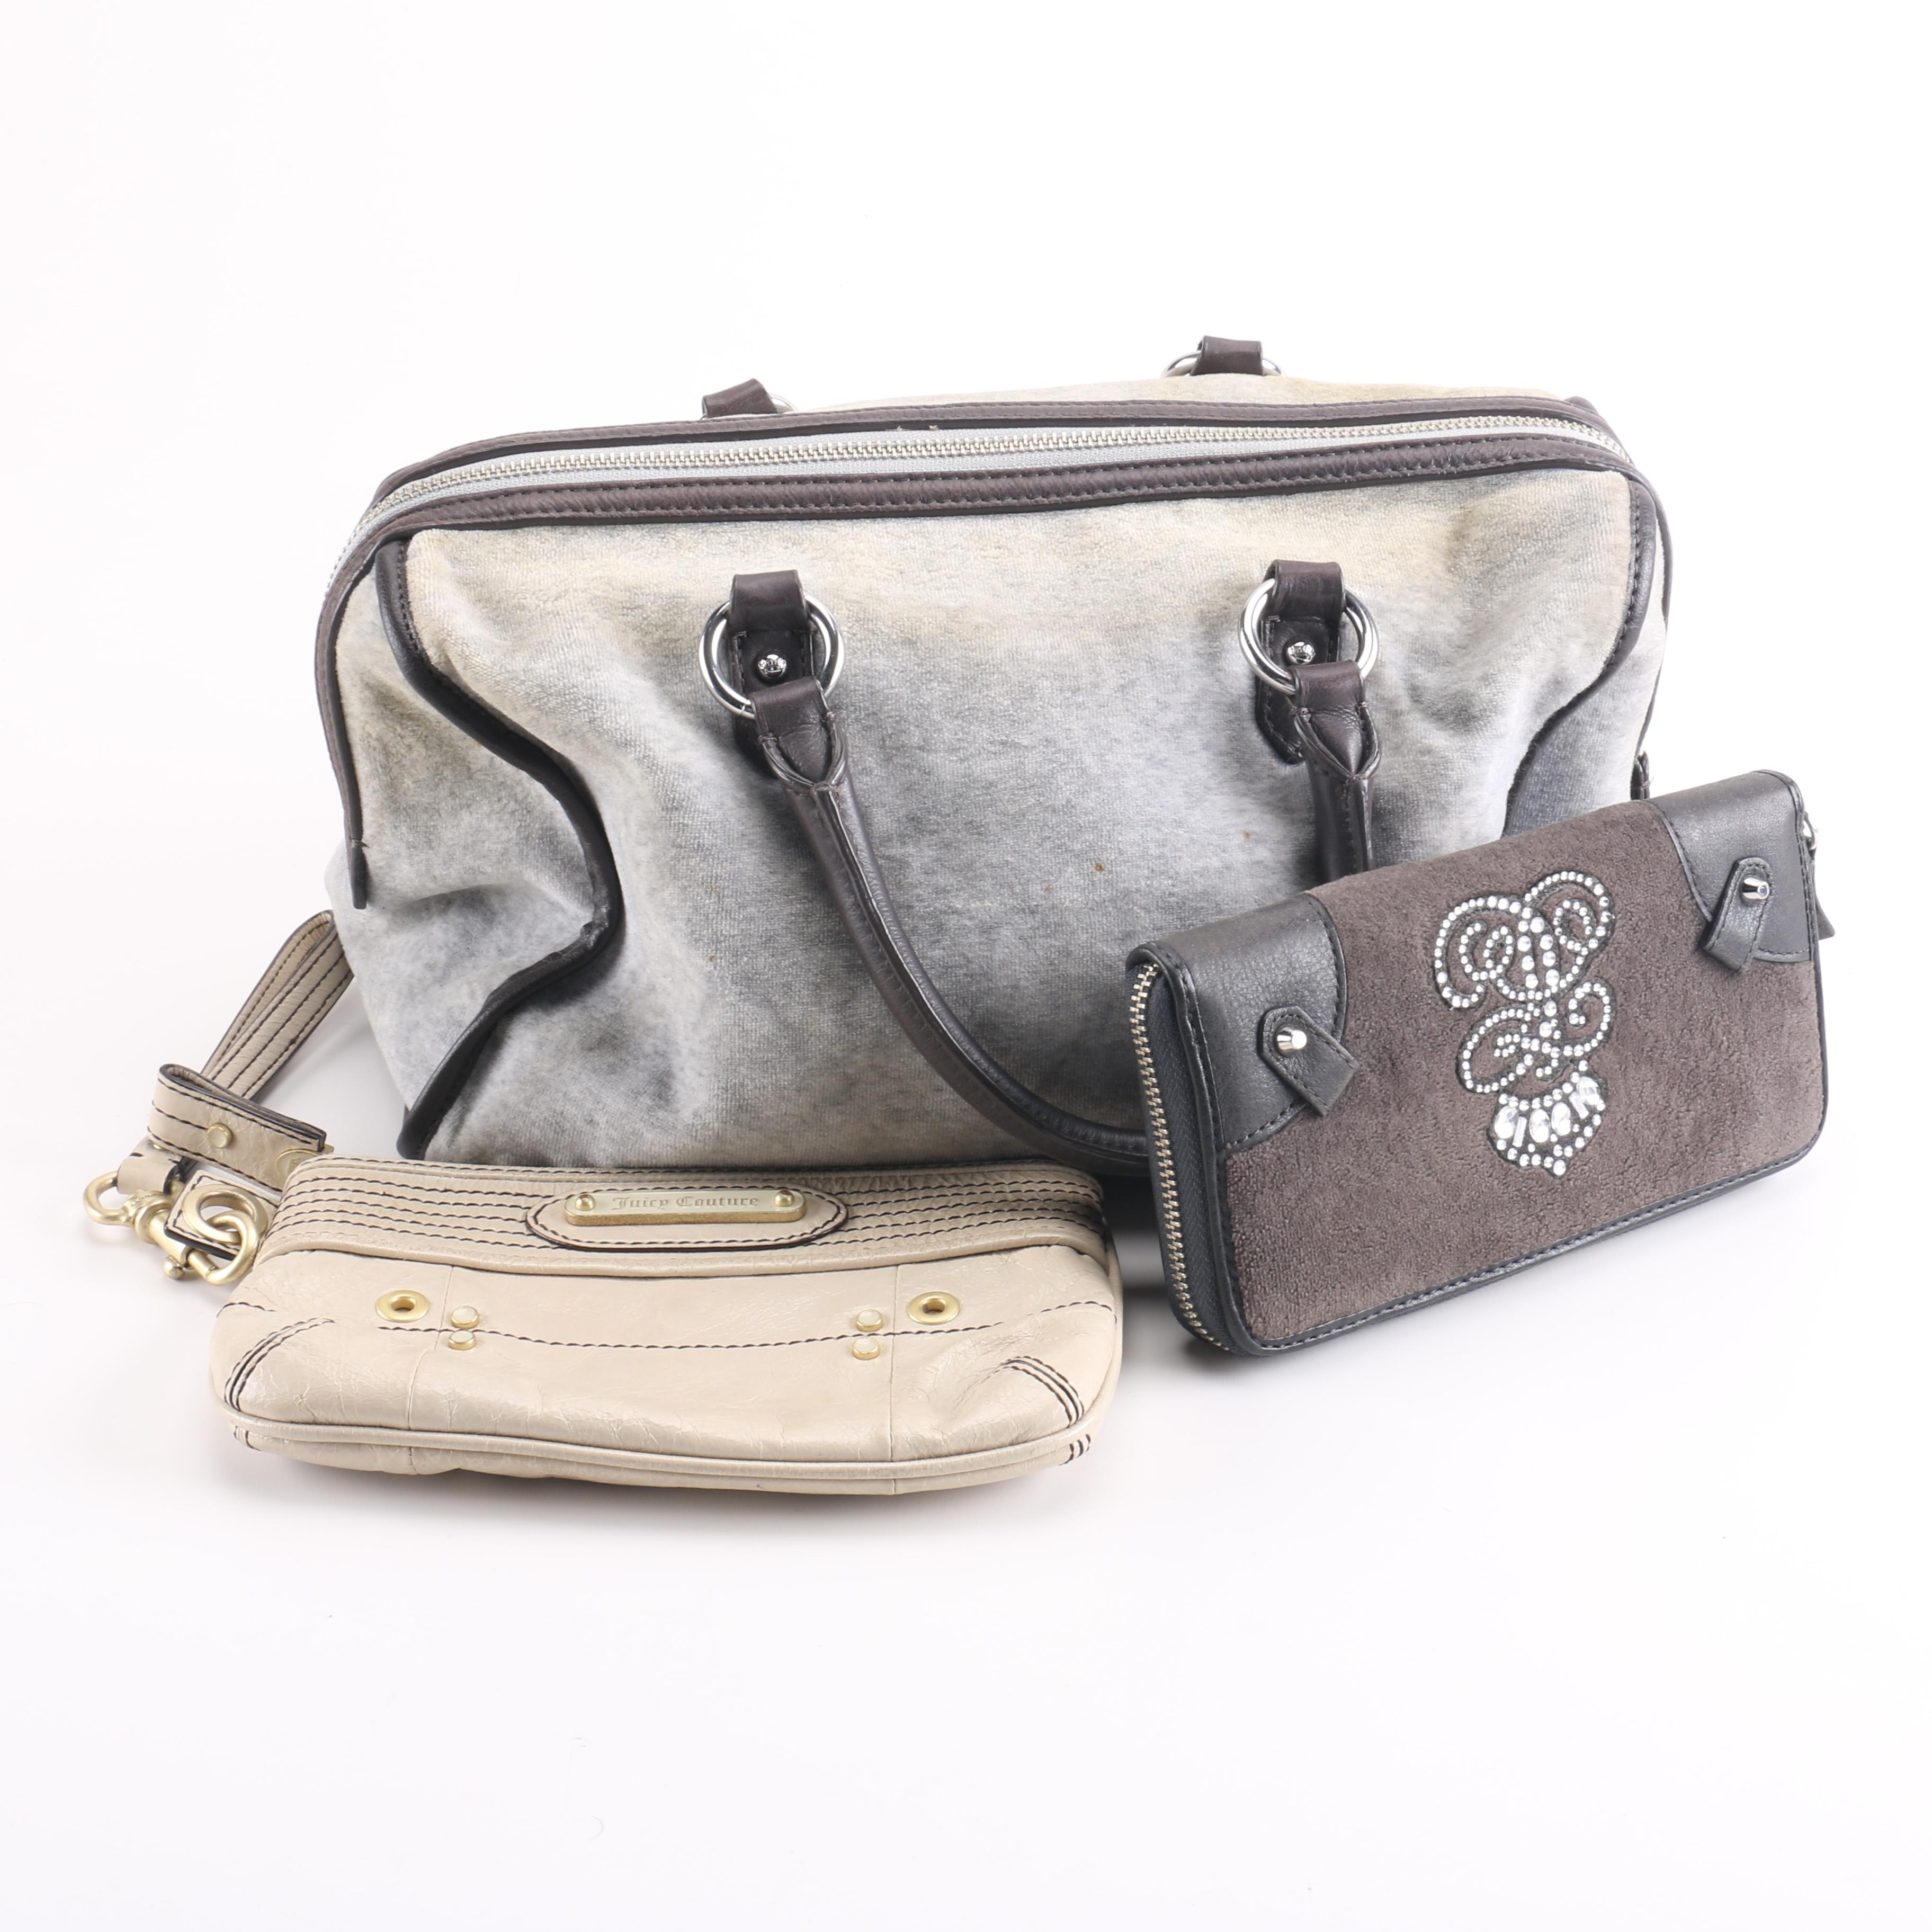 Juicy Couture Handbag and Wallets